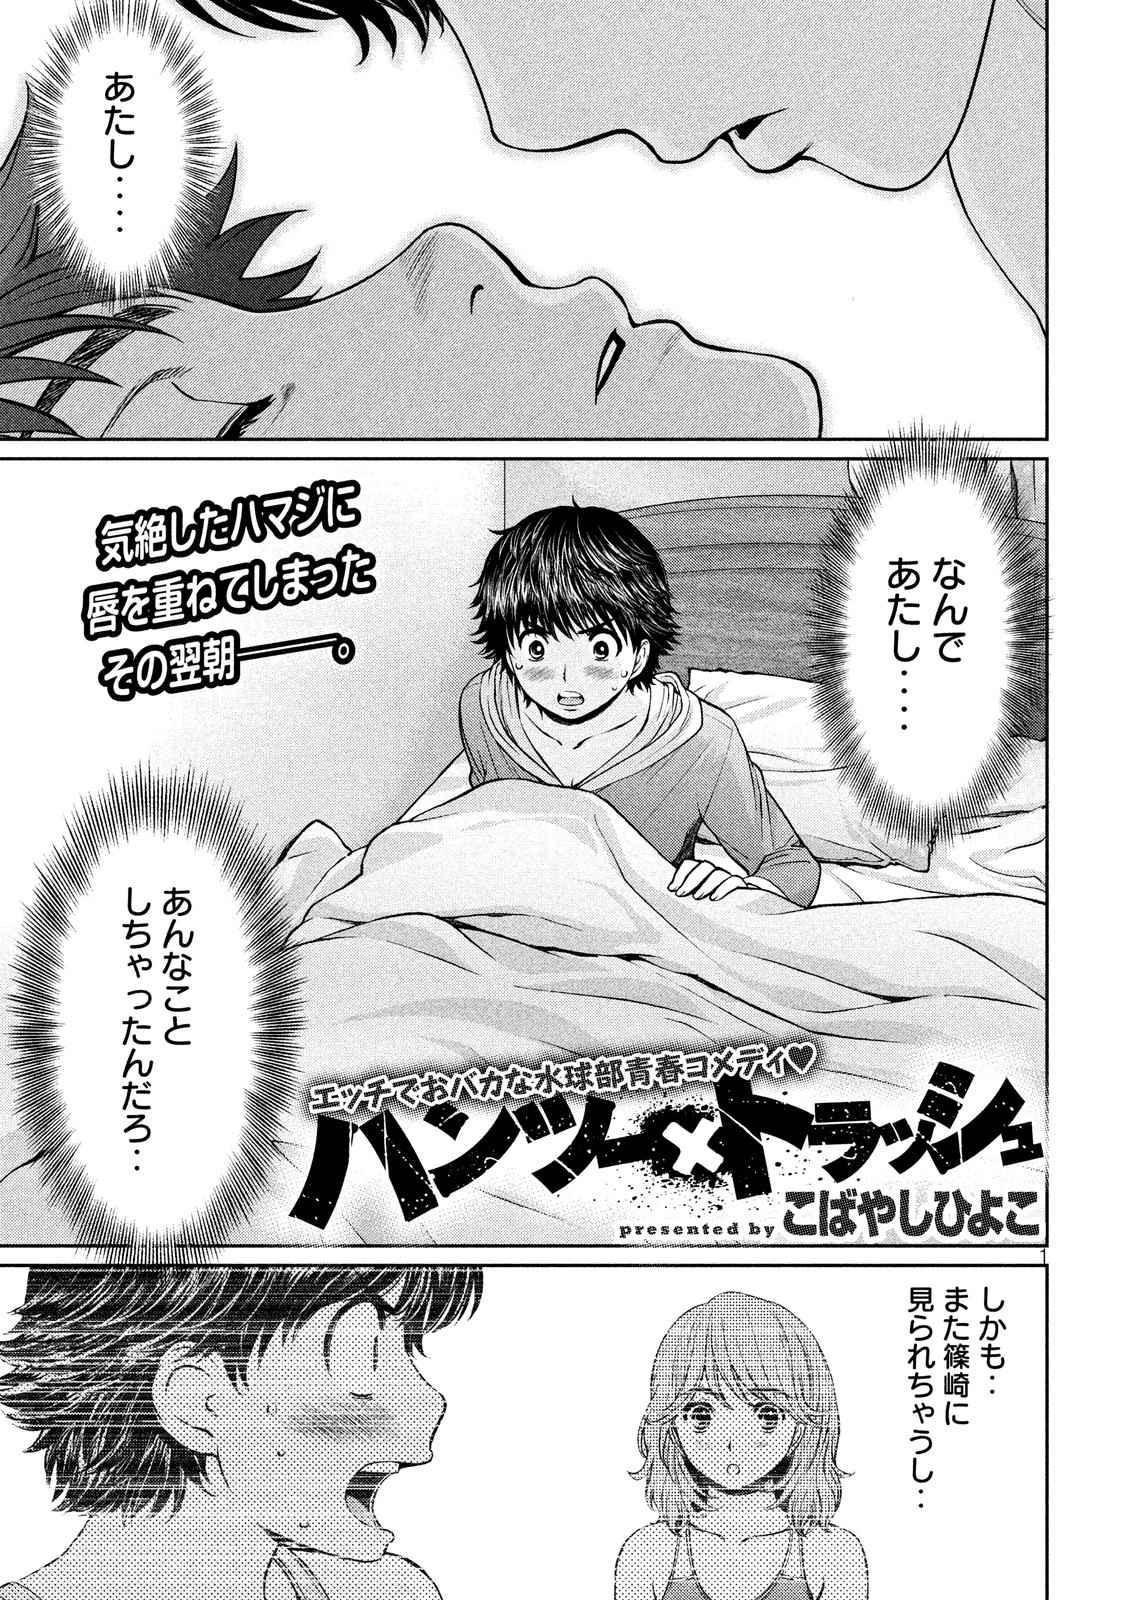 Hantsu x Trash - Chapter 138 - Page 1